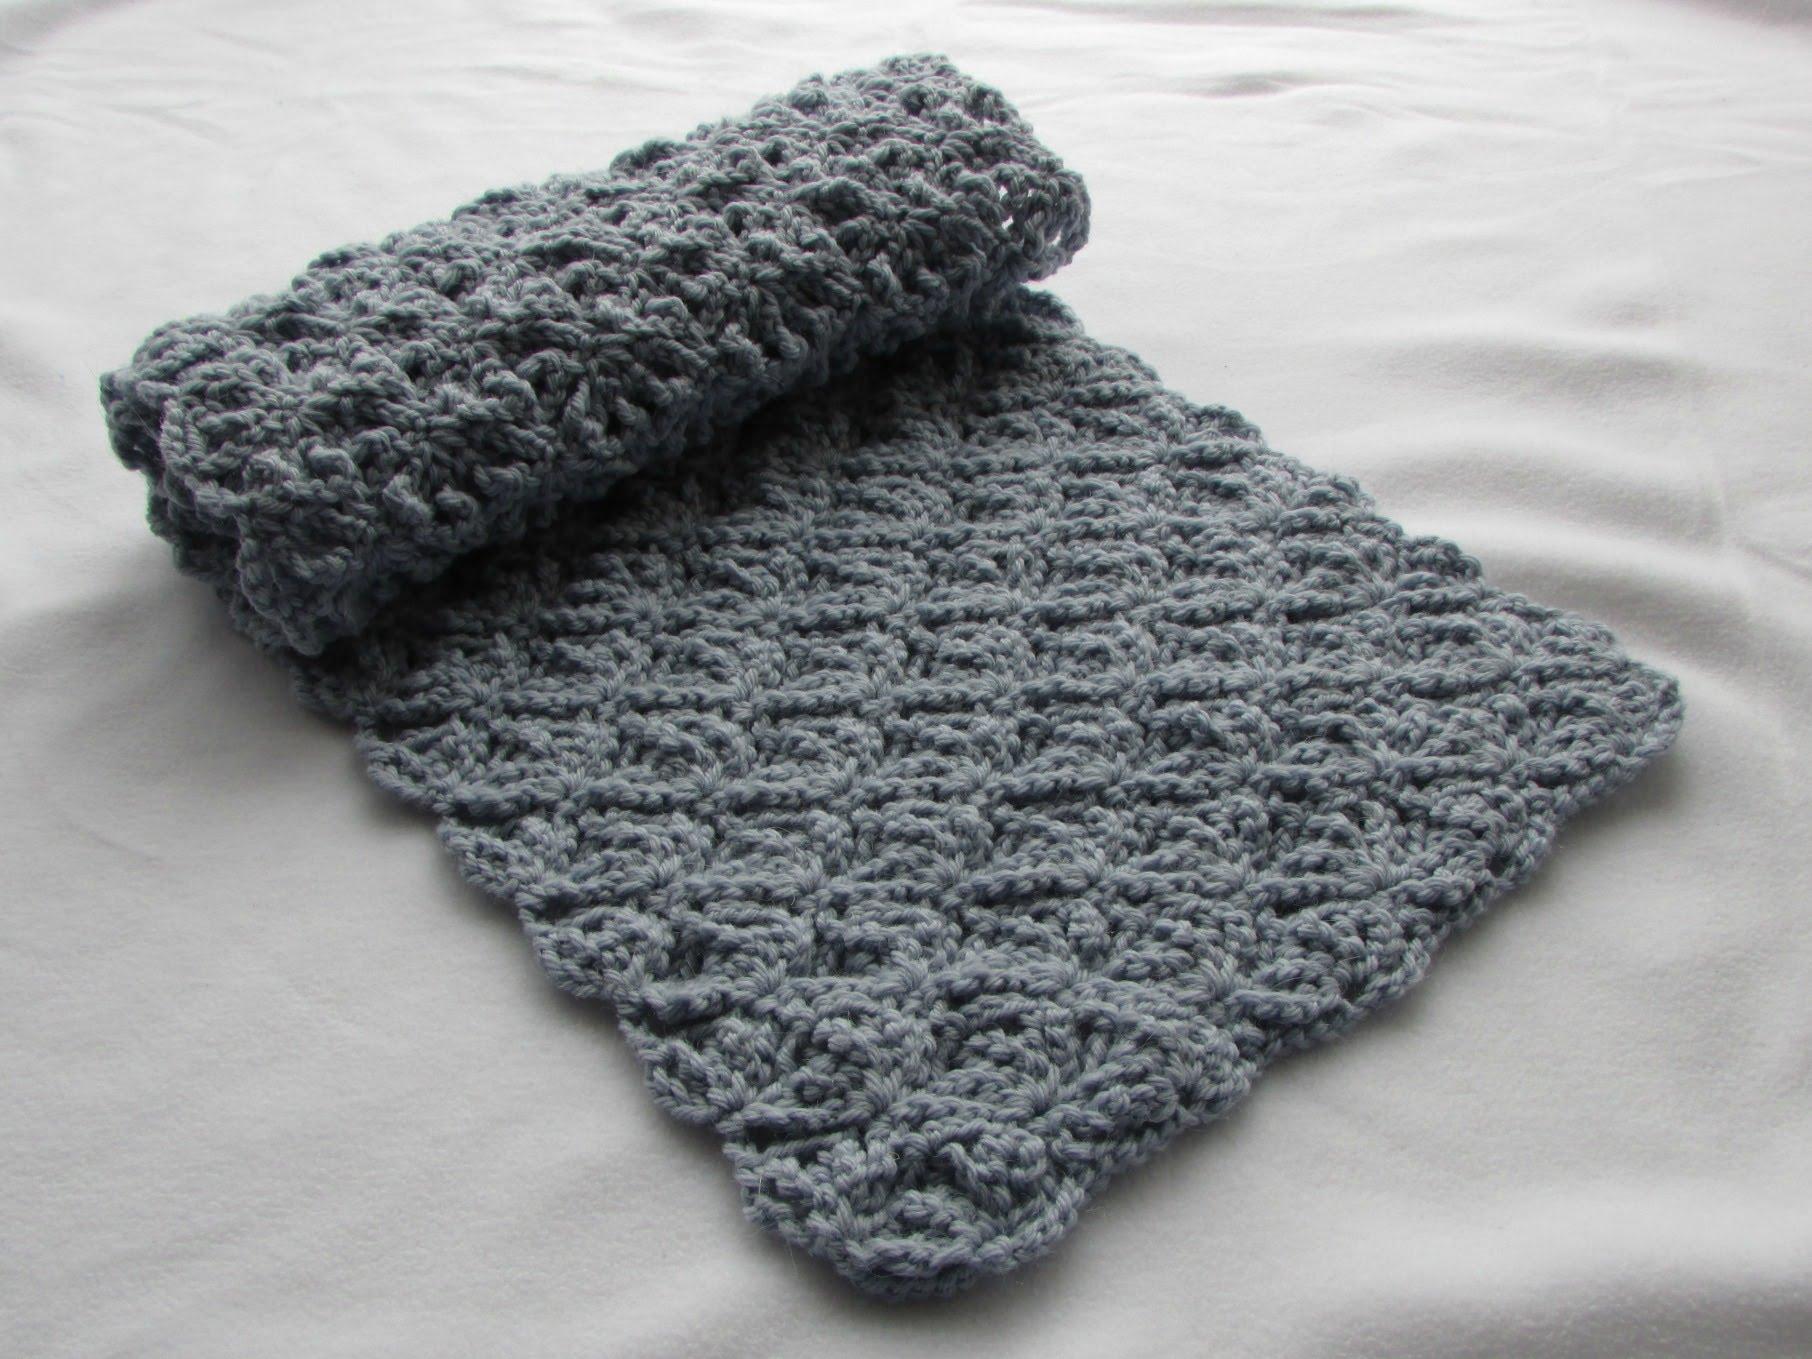 easy crochet scarf easy crochet pretty lace scarf tutorial - part 1 - youtube dgahamh